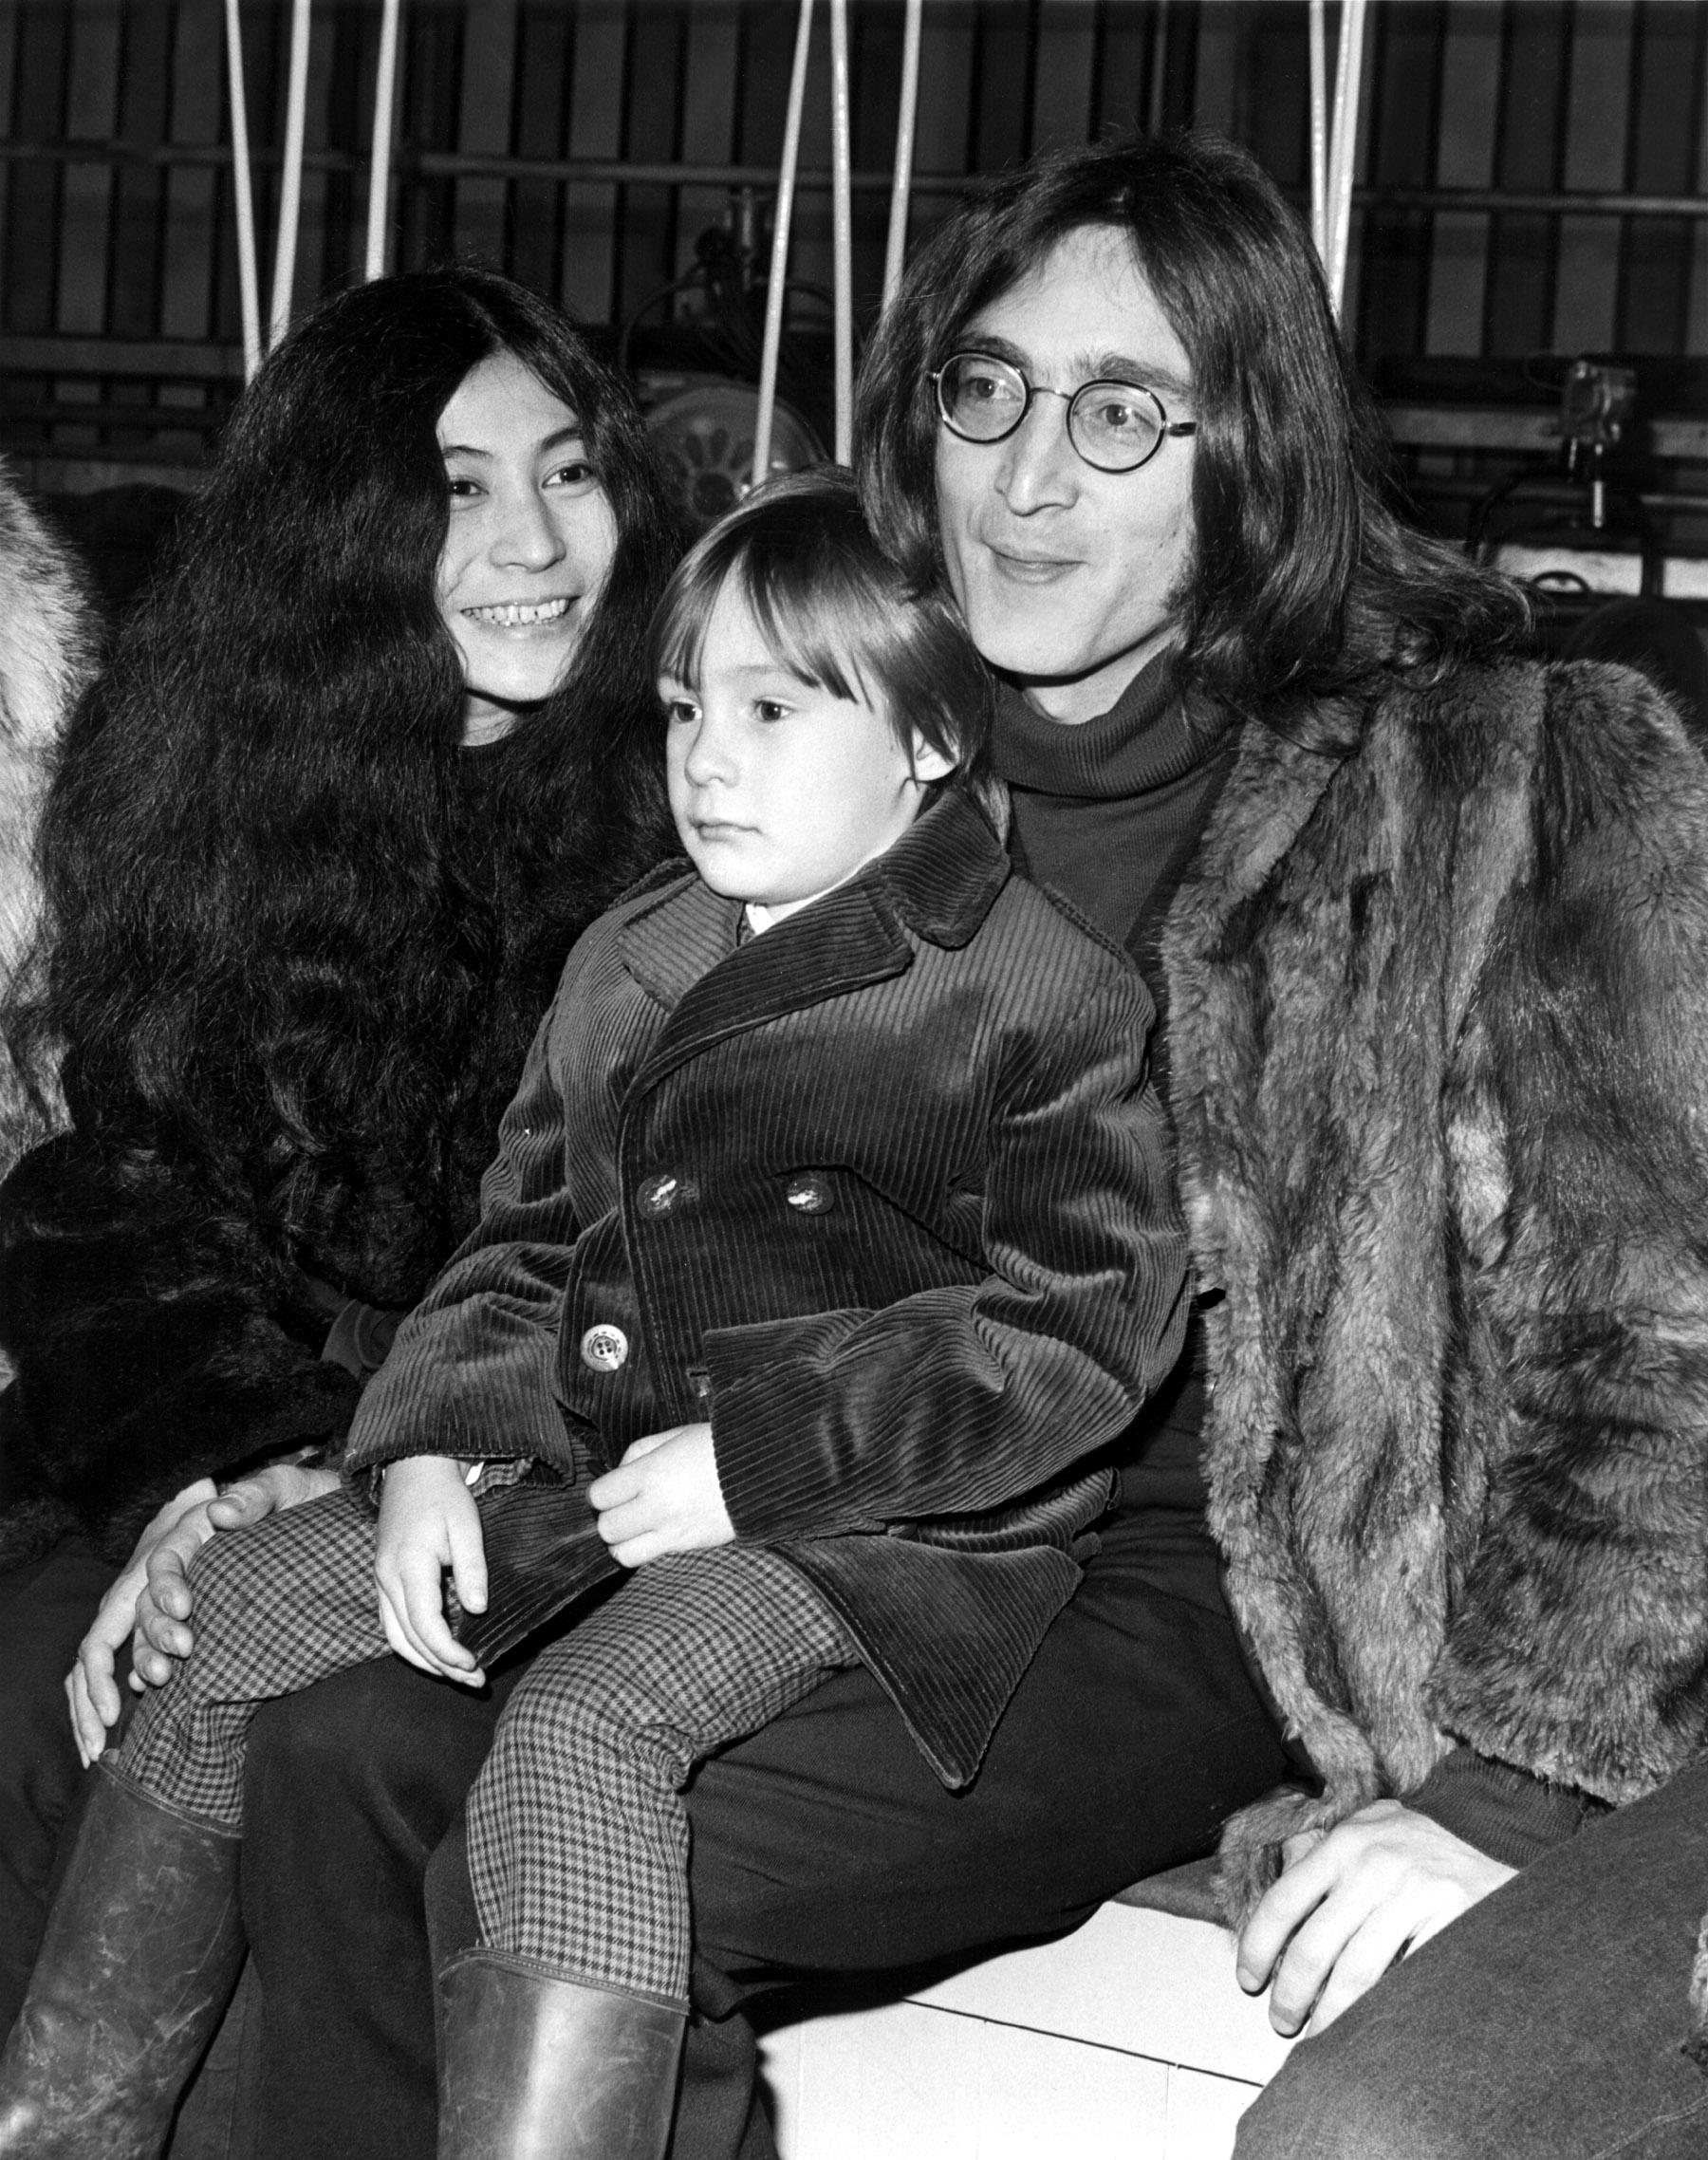 Yoko Ono, Julian Lennon, John Lennon watching the rehearsal for ROLLING STONES' ROCK 'N' ROLL CIRCUS in England, 12/11/68